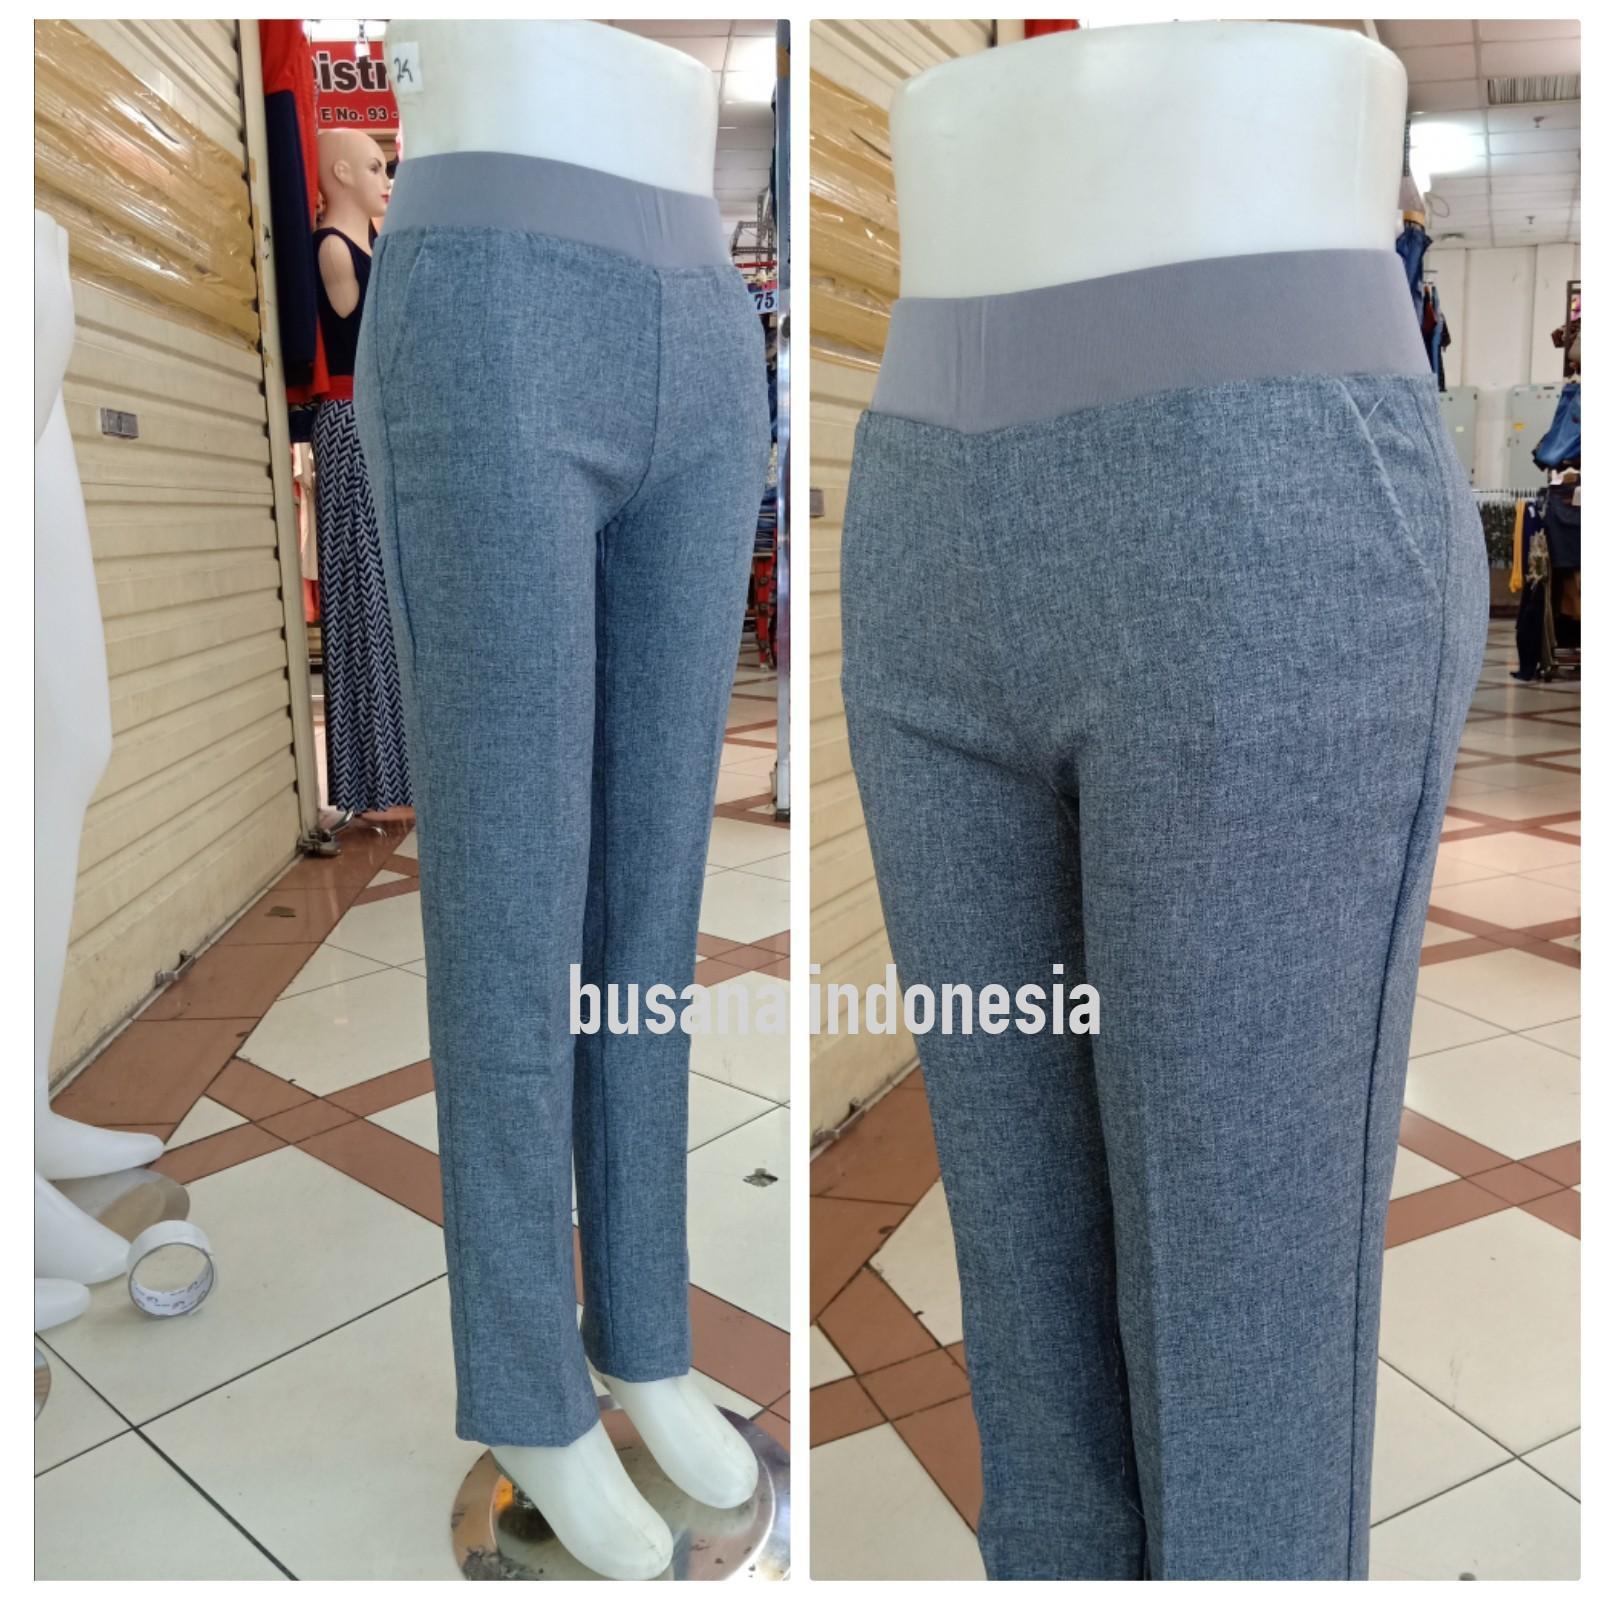 BUSANA INDONESIA celana kantor wanita/celana kerja wanita/celana bahan wanita/celana panjang